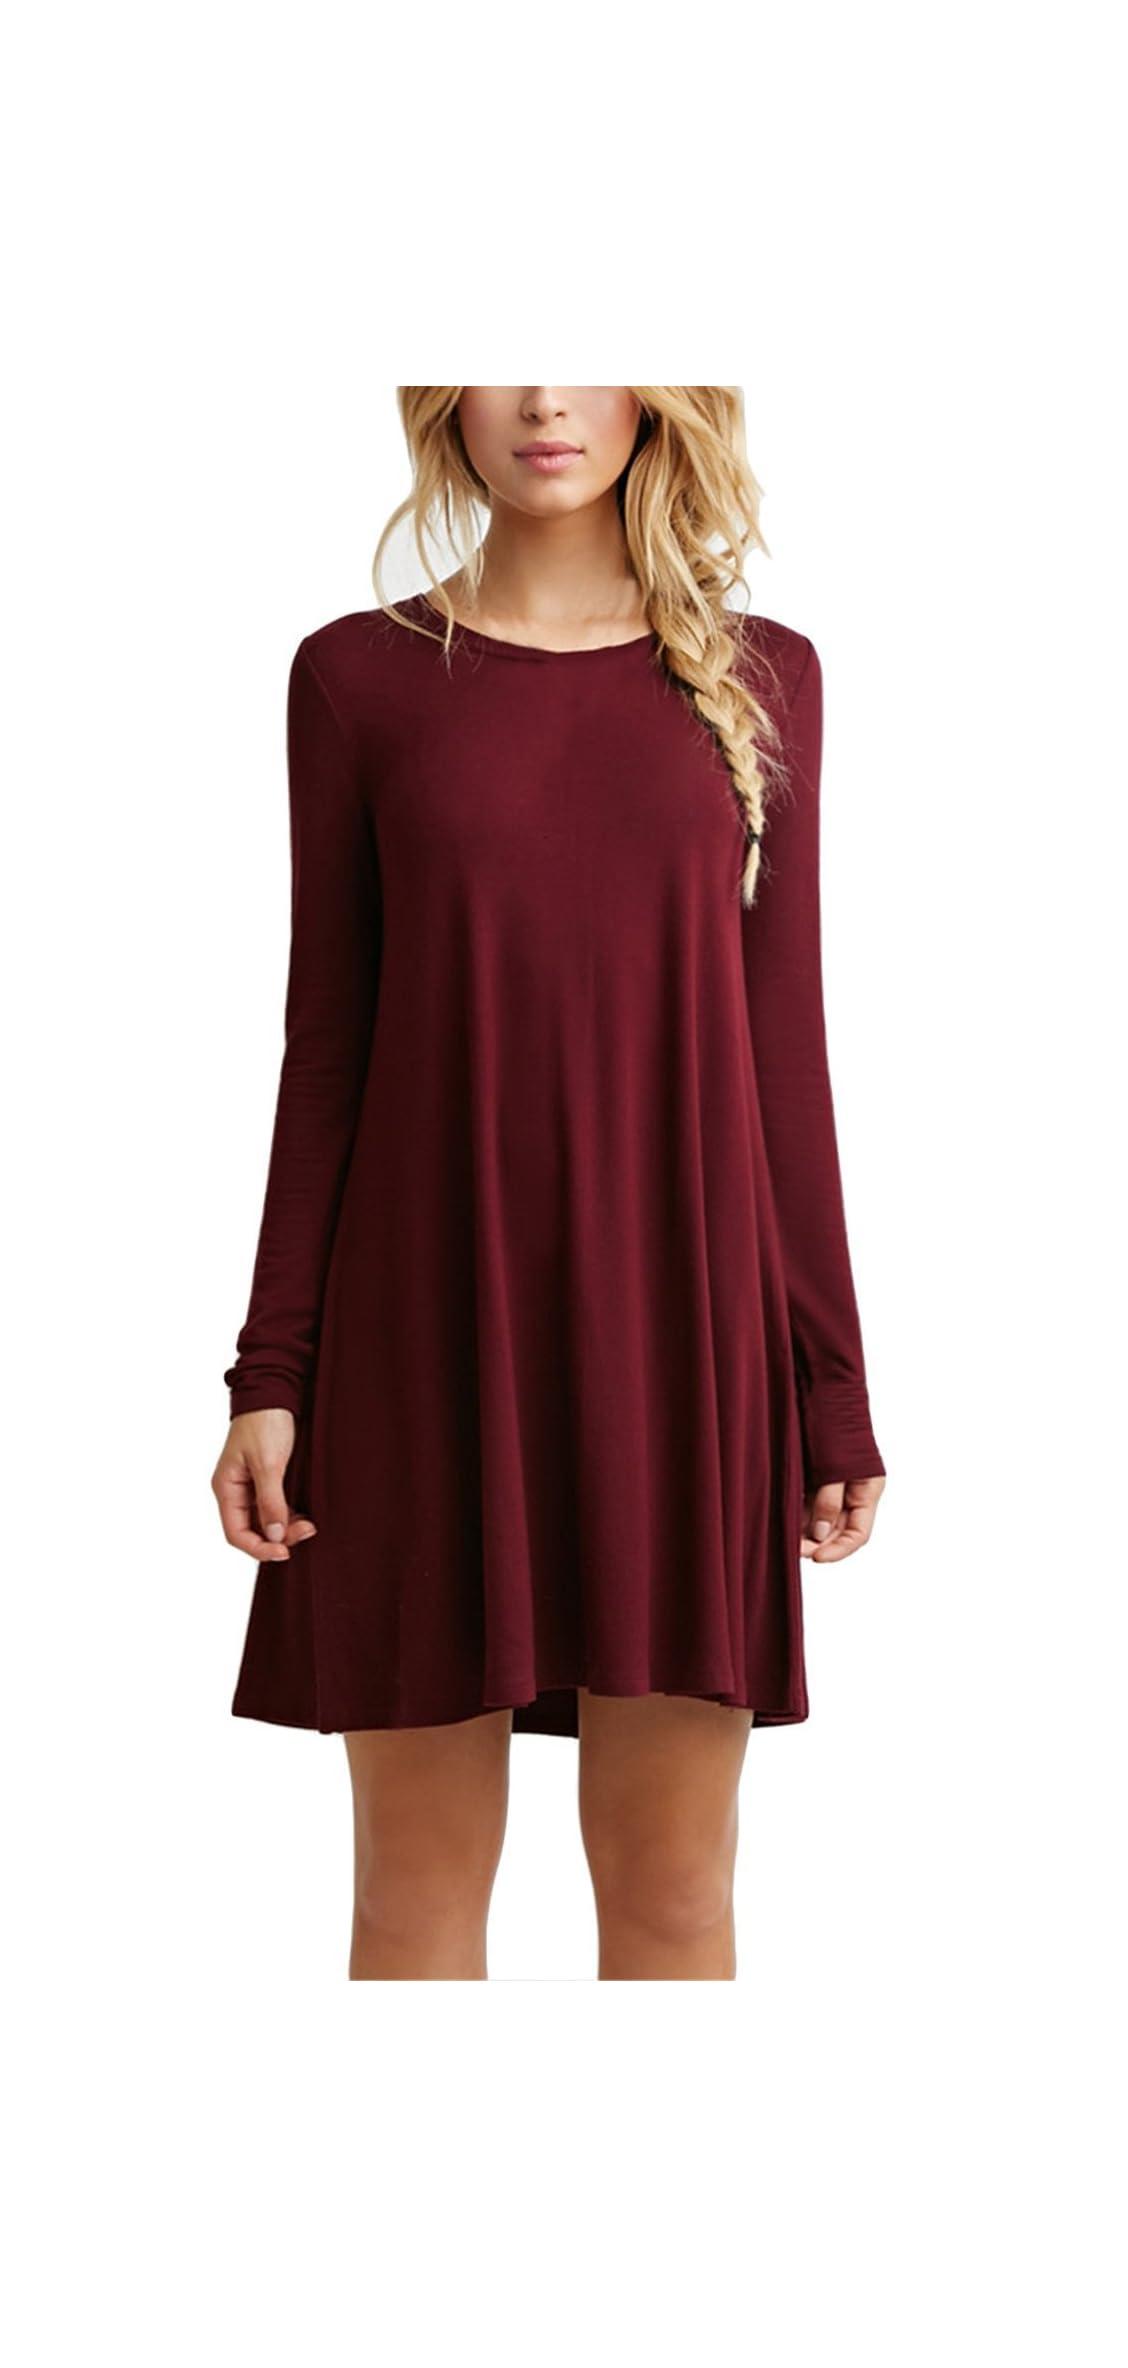 Women's Casual Plain Fit Flowy Simple Swing T-shirt Loose